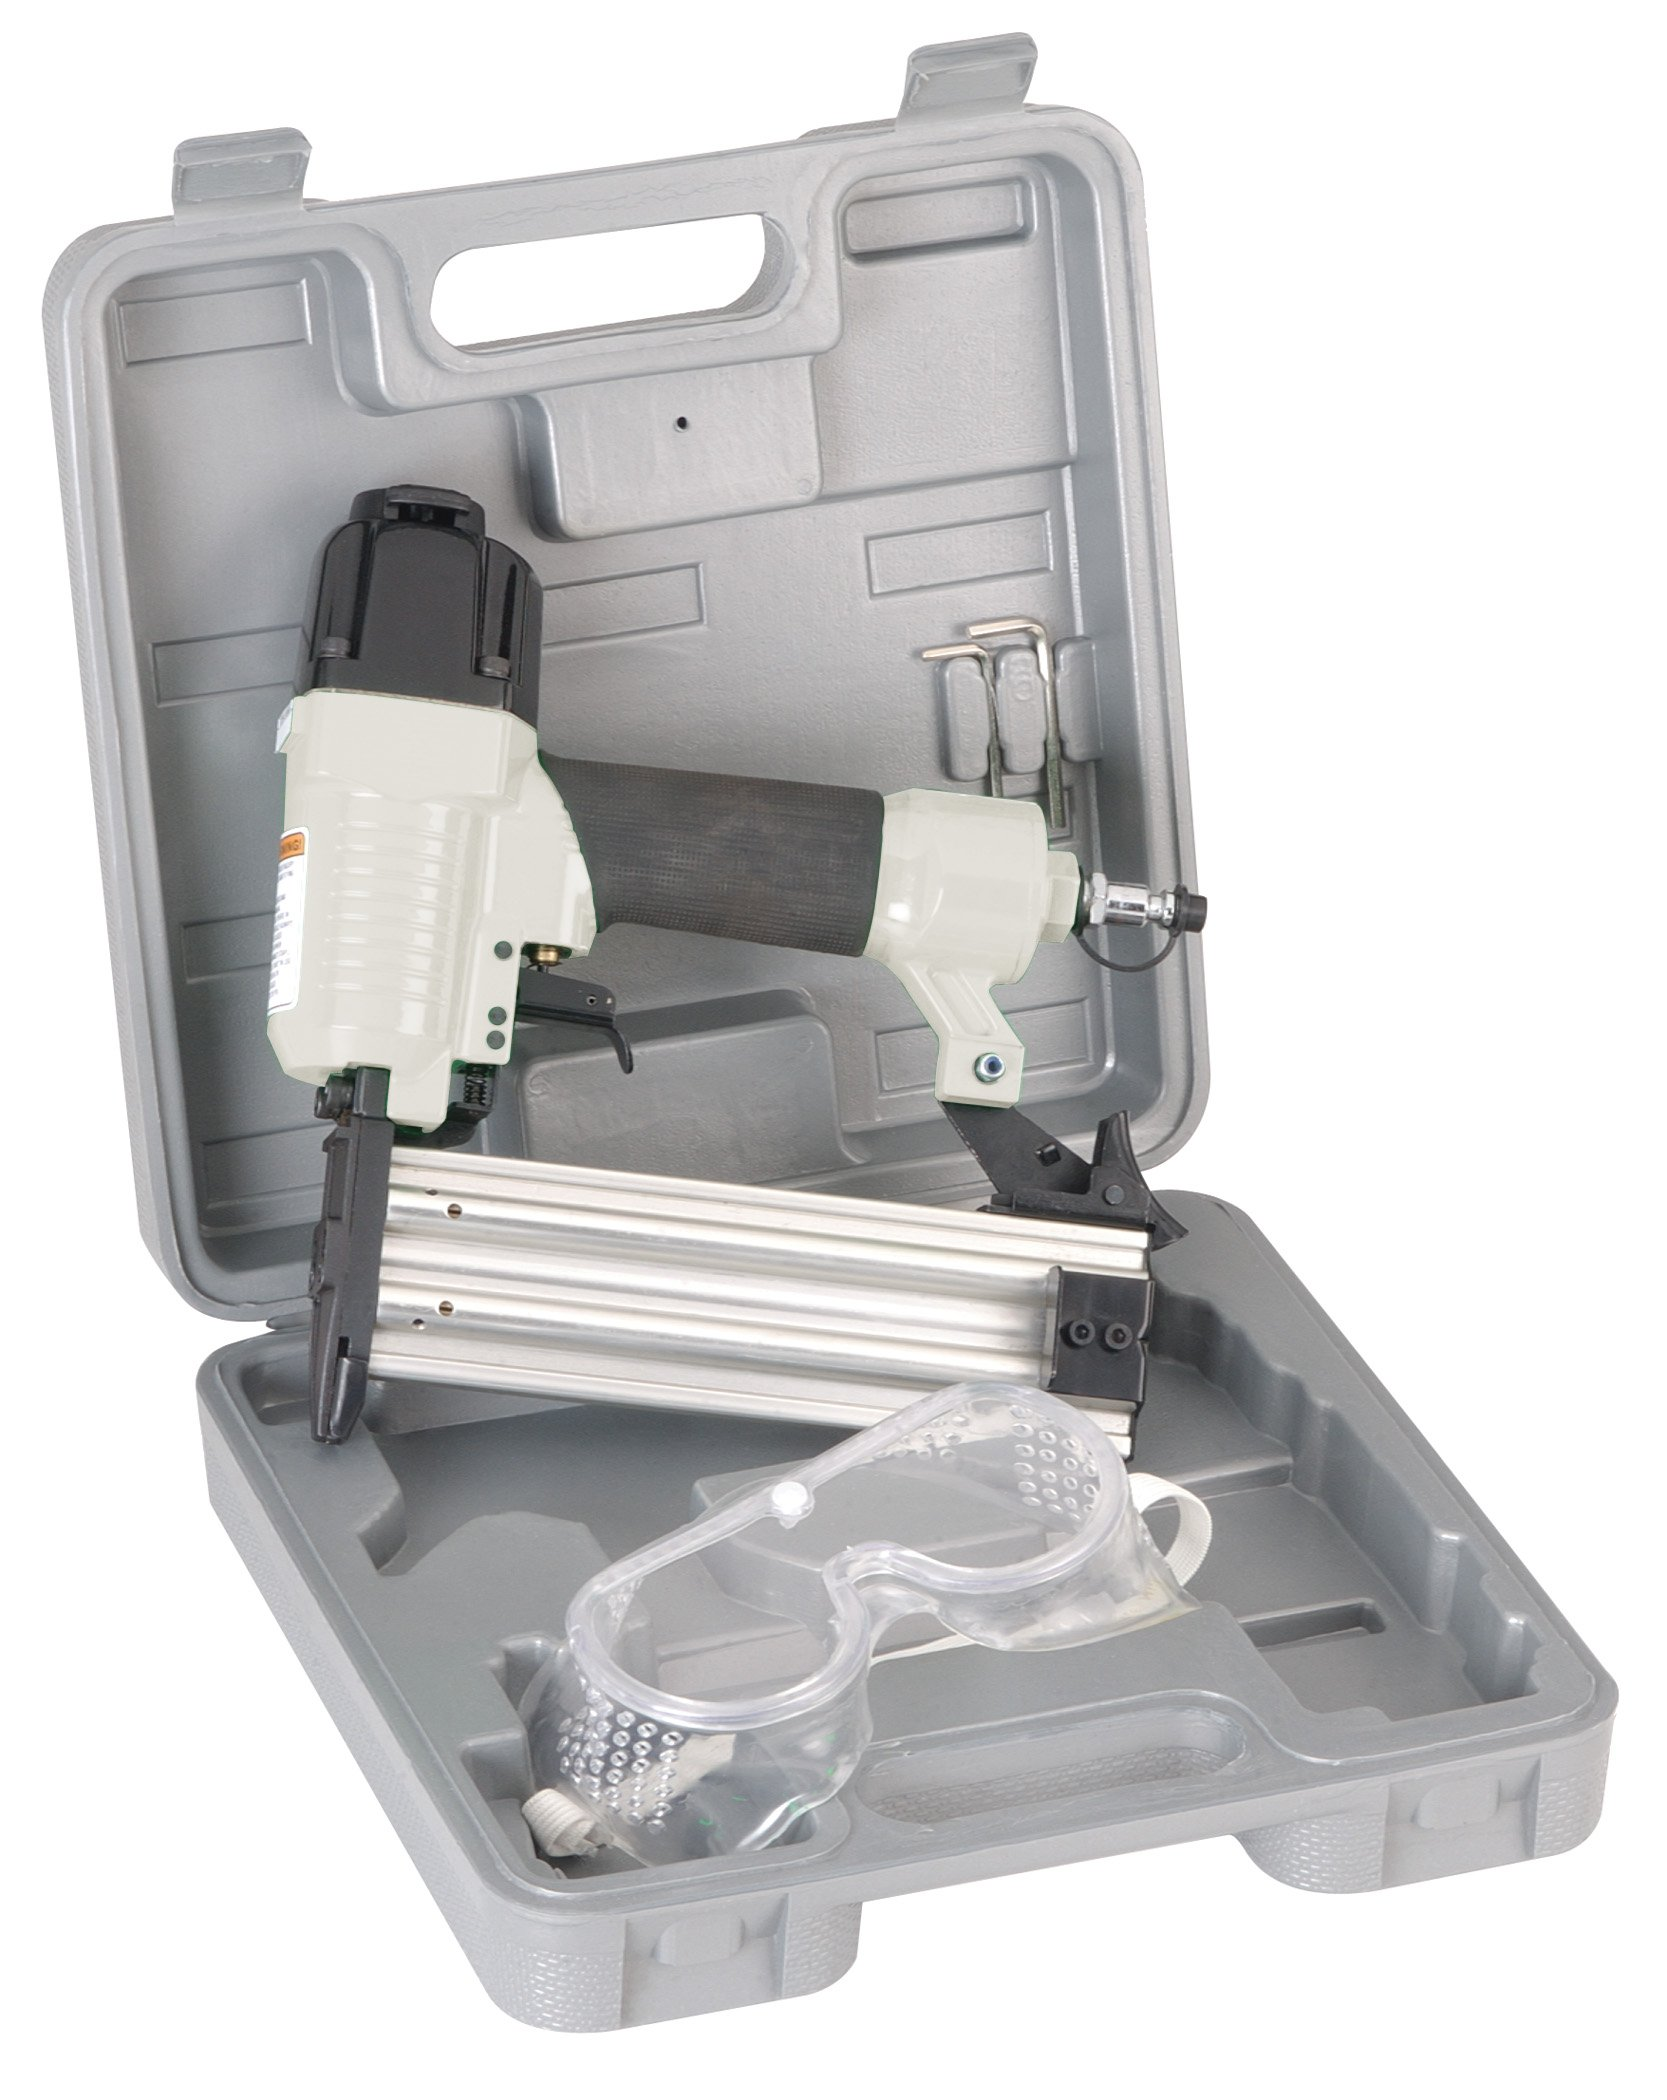 Shop Fox W1774 18-Gauge Brad Nailer Kit